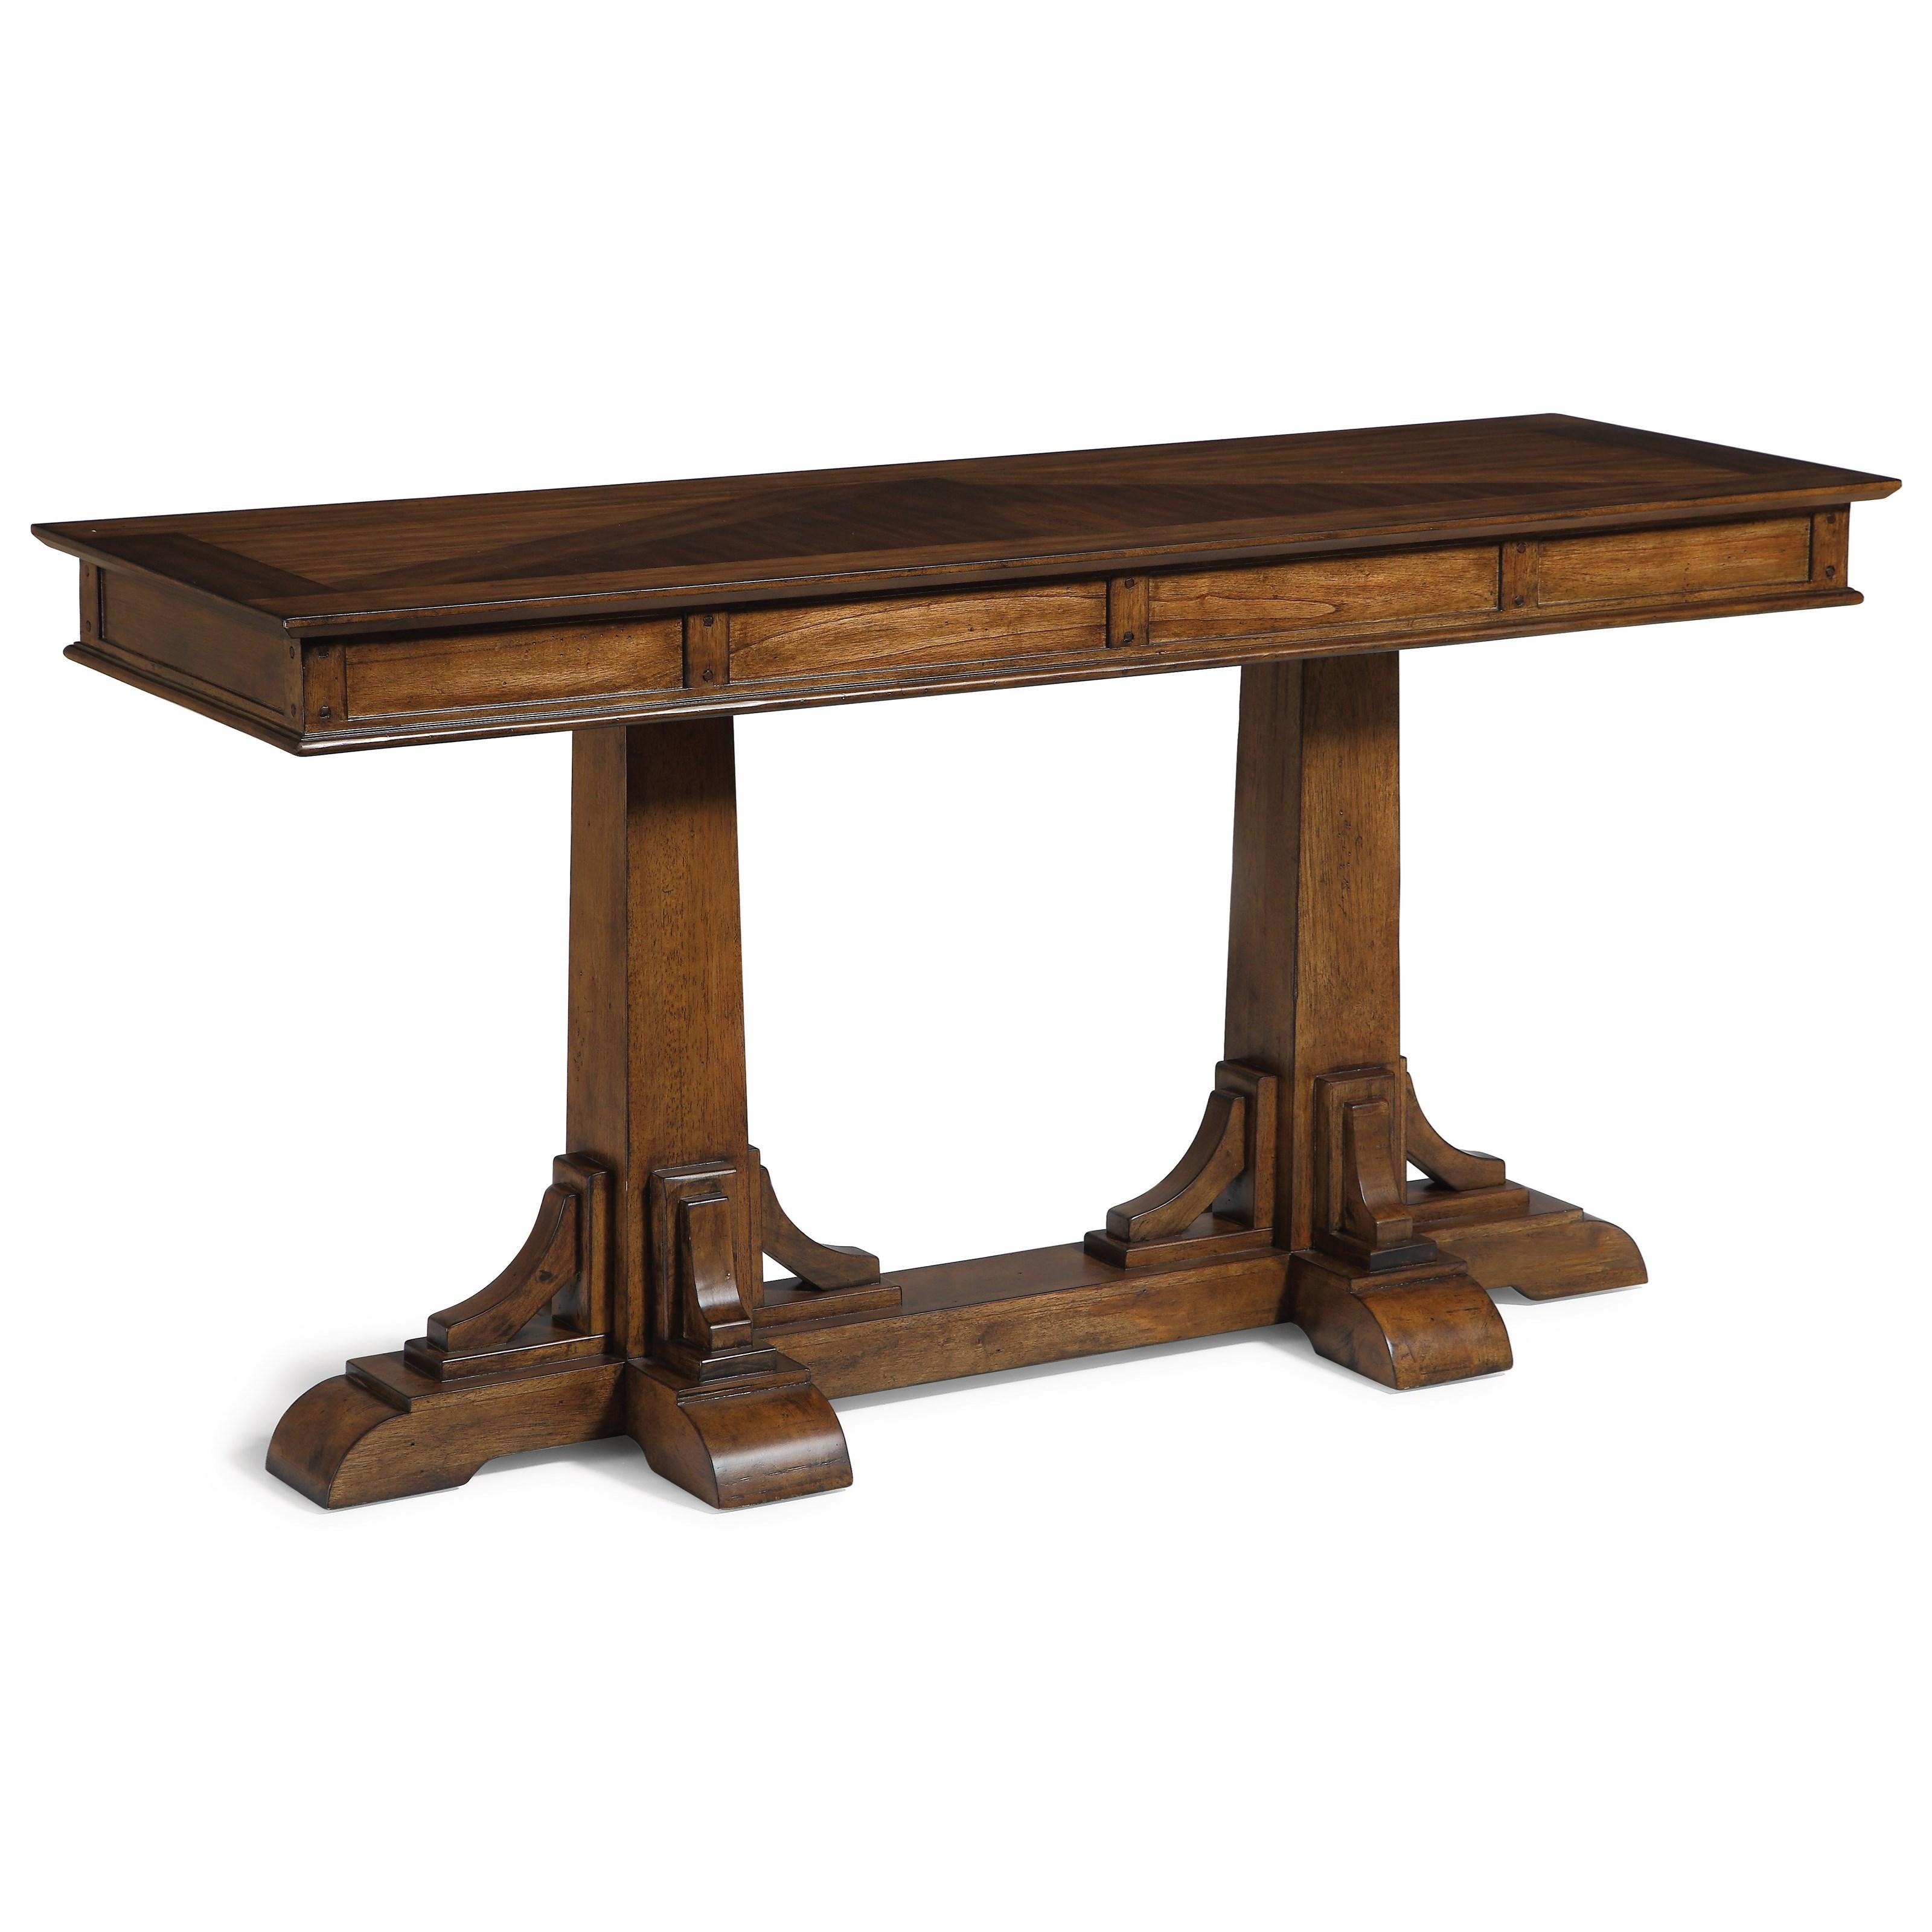 Flexsteel Wynwood Collection Windsor Mission Sofa Table Item Number W1434 04